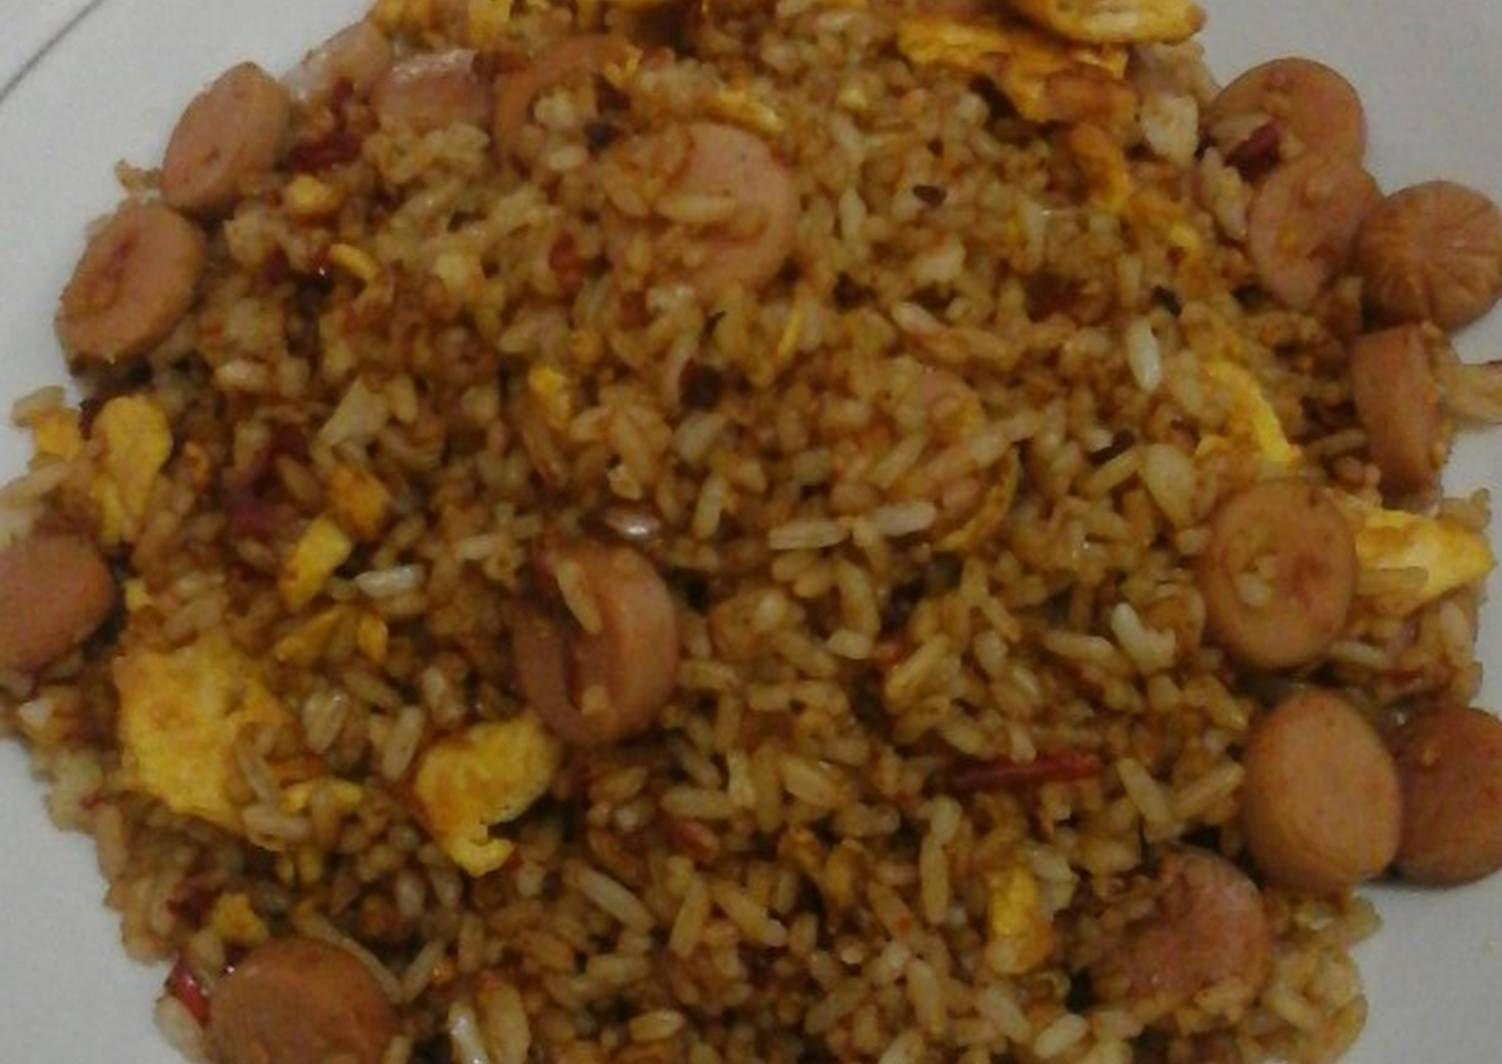 Resep Nasi Goreng Abang2 Oleh Yulis Ermawati Resep Makanan Resep Nasi Goreng